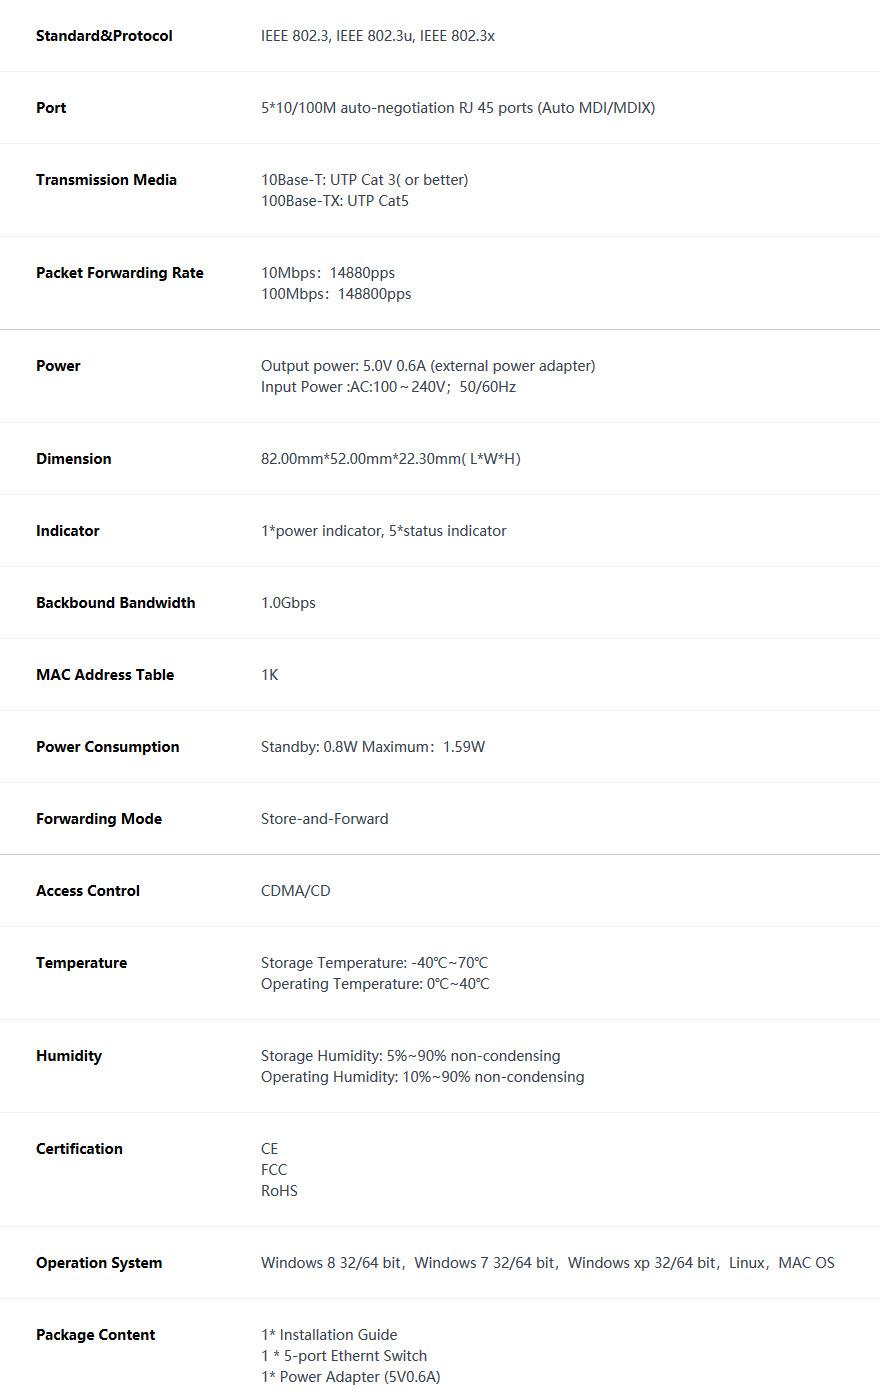 سوئیچ پنج پورت غیر مدیریتی اترنت تندا Tenda S105